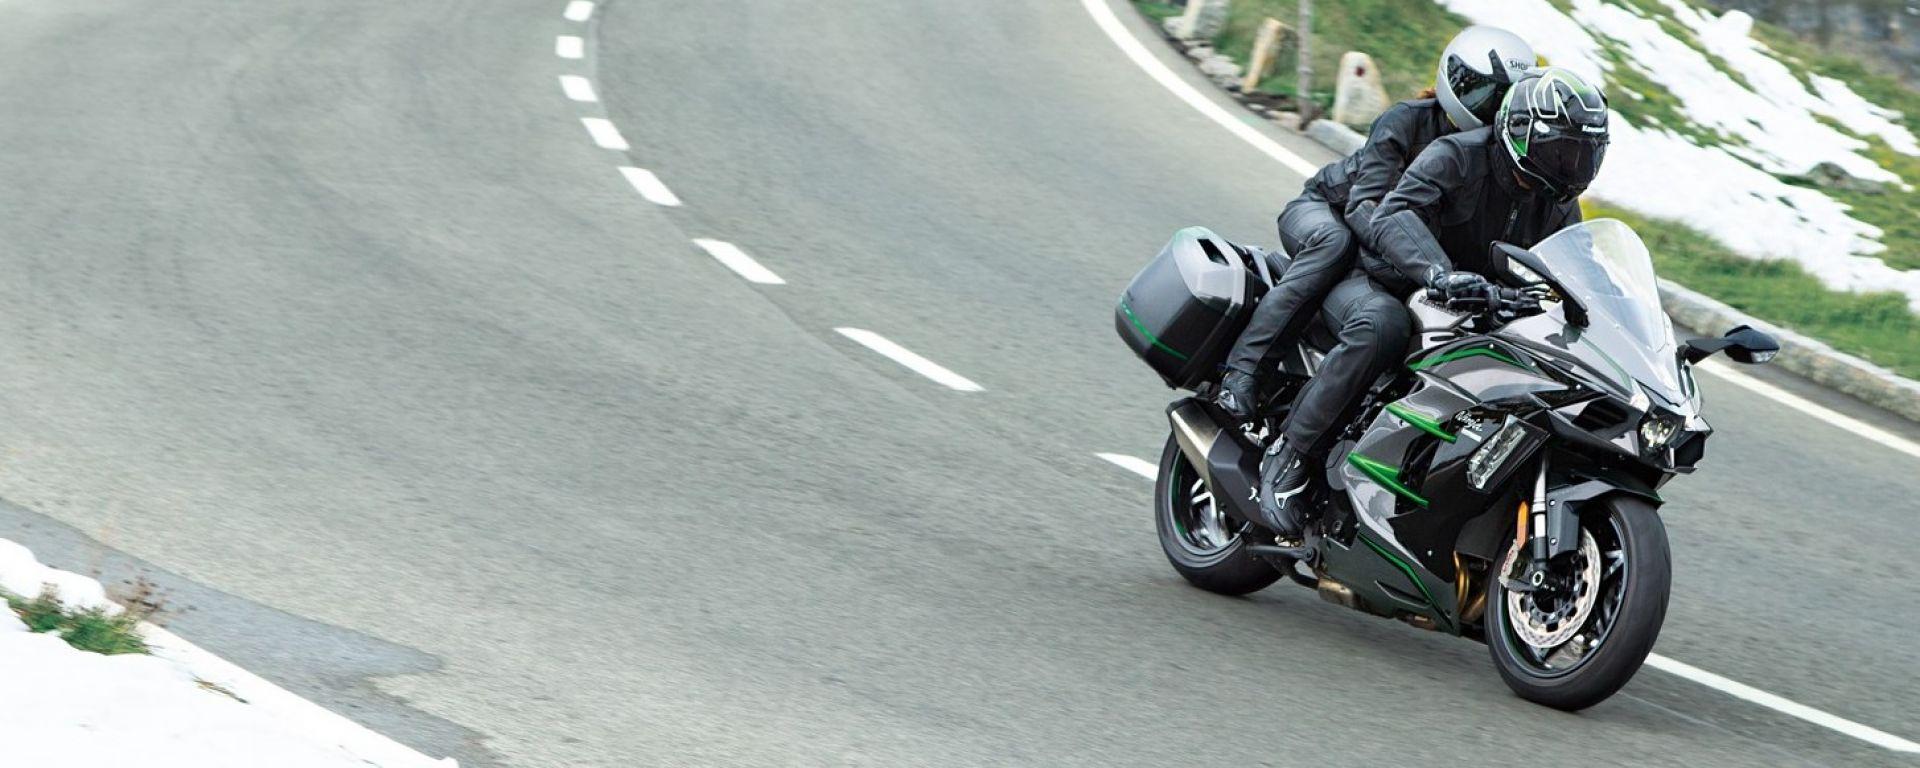 Nuova Kawasaki Ninja H2 SX SE+